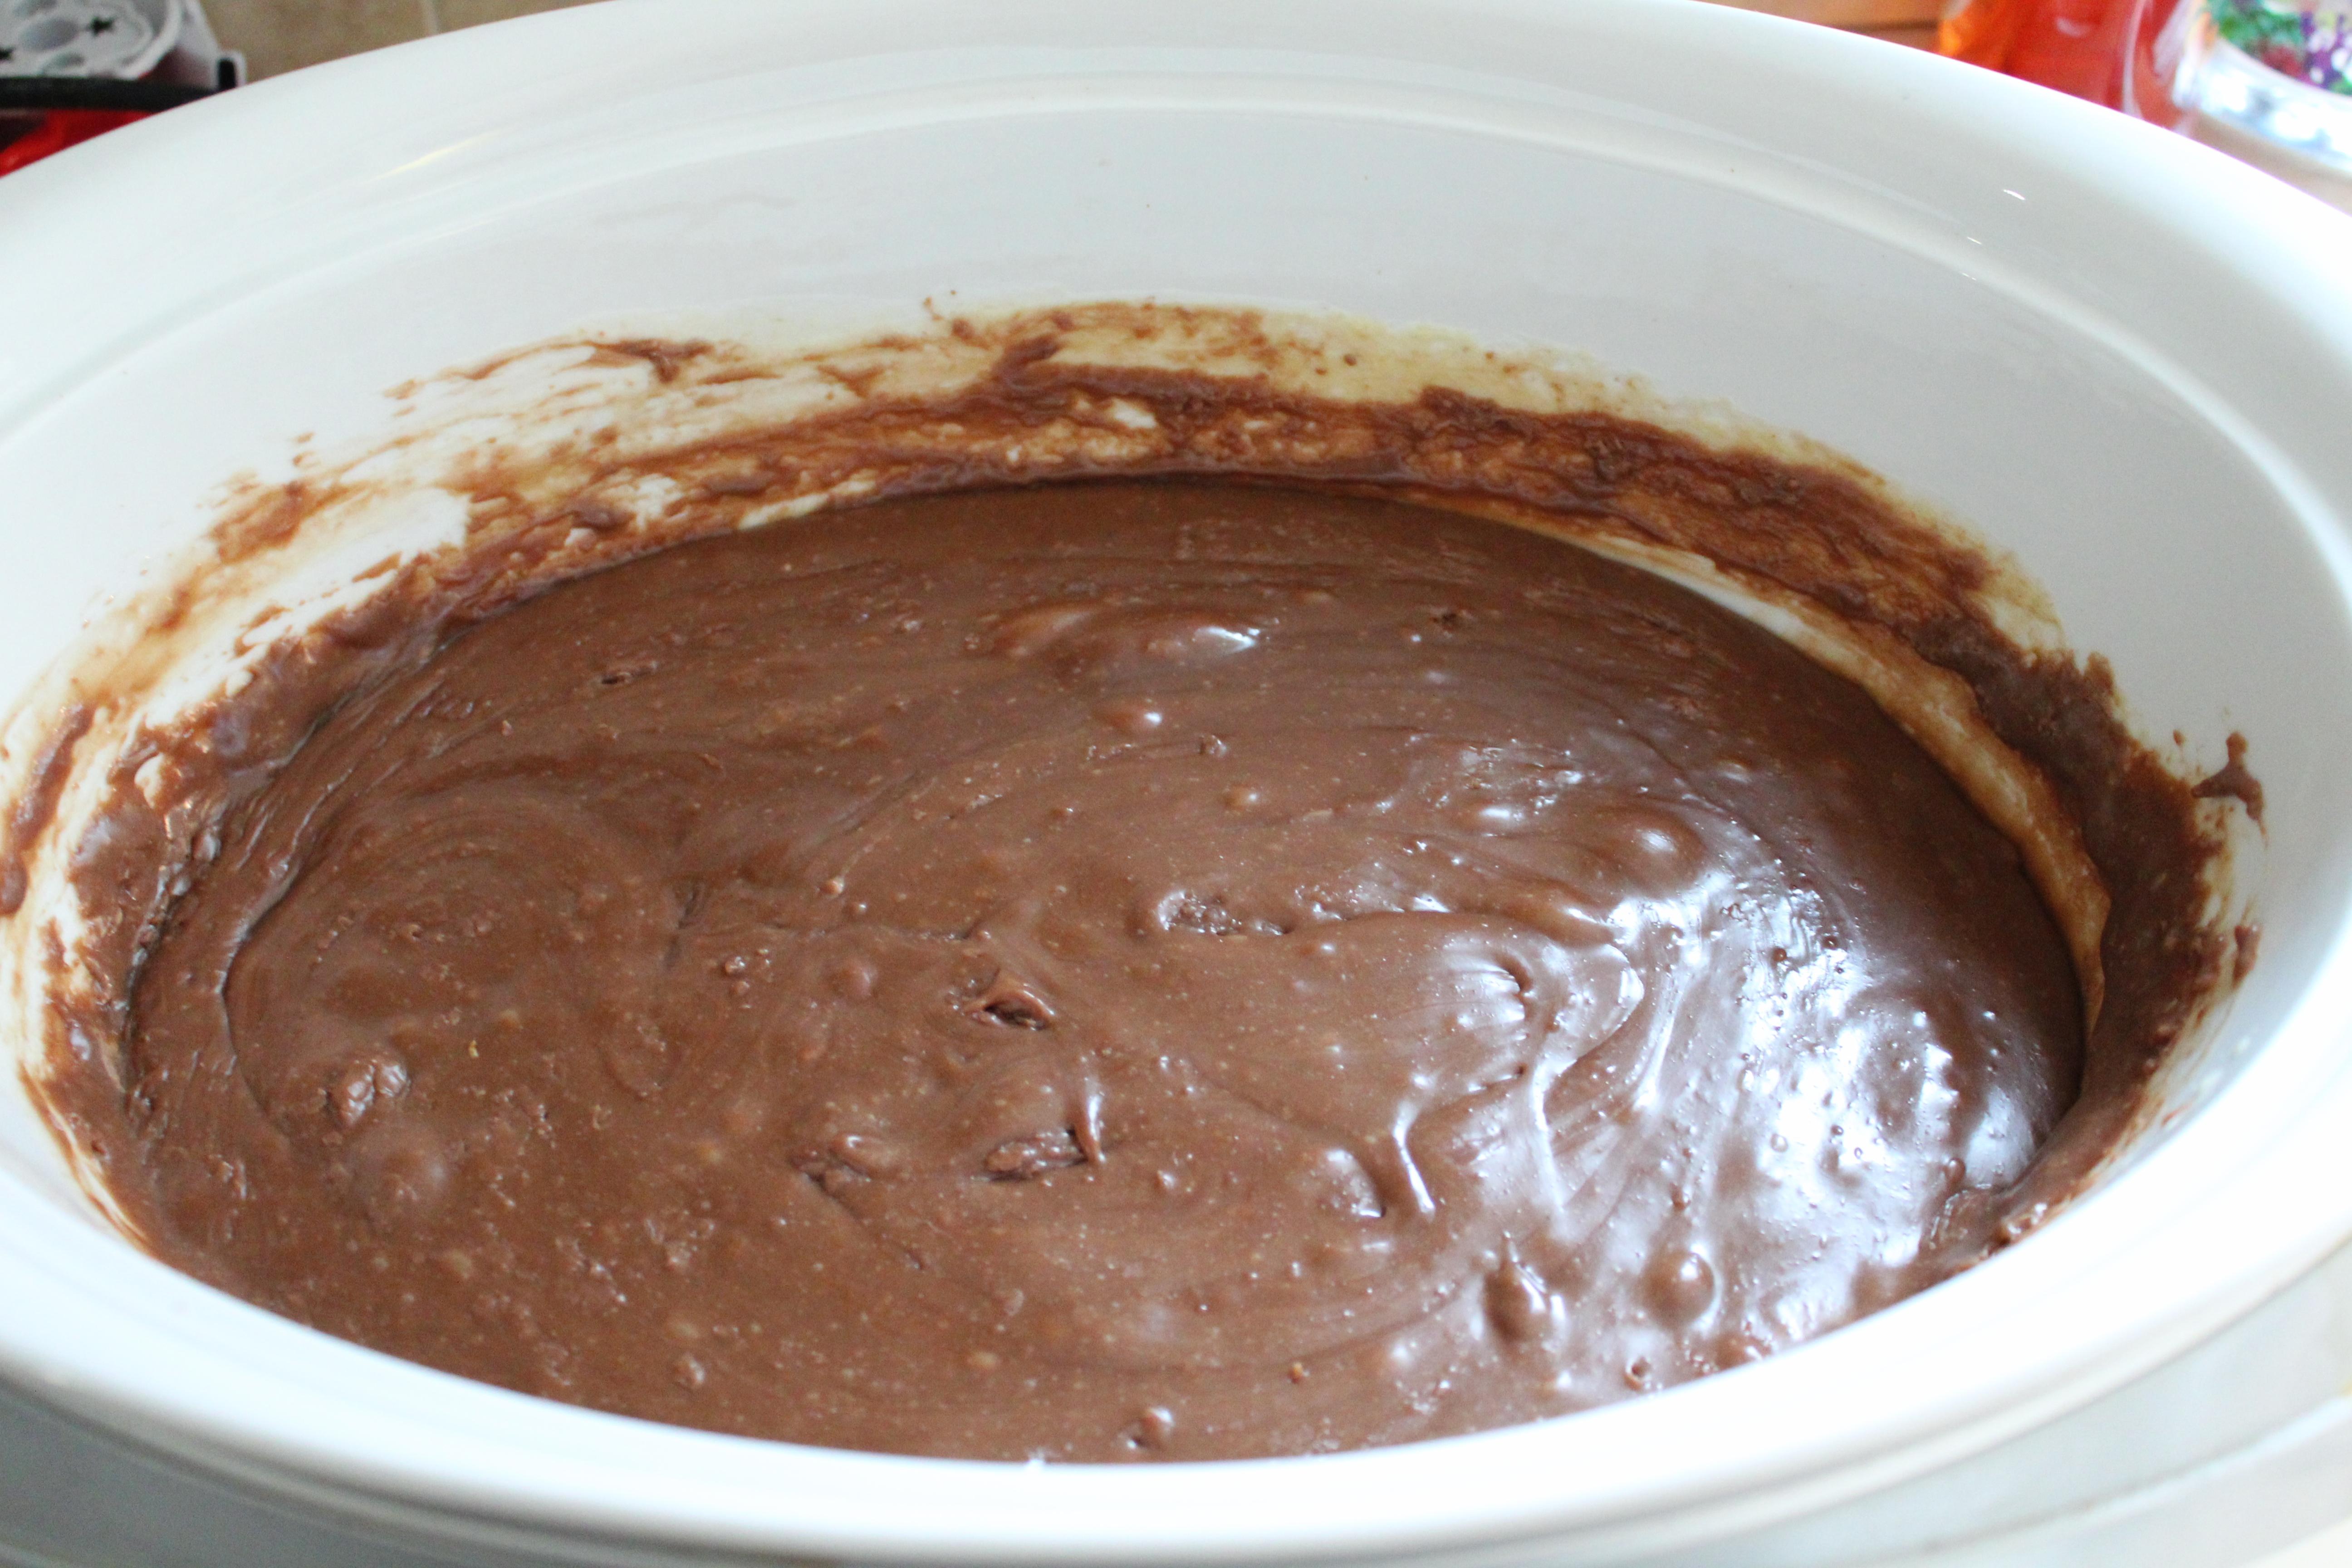 Slow Cooker Crockpot Mars Bar Chocolate Fudge Recipe